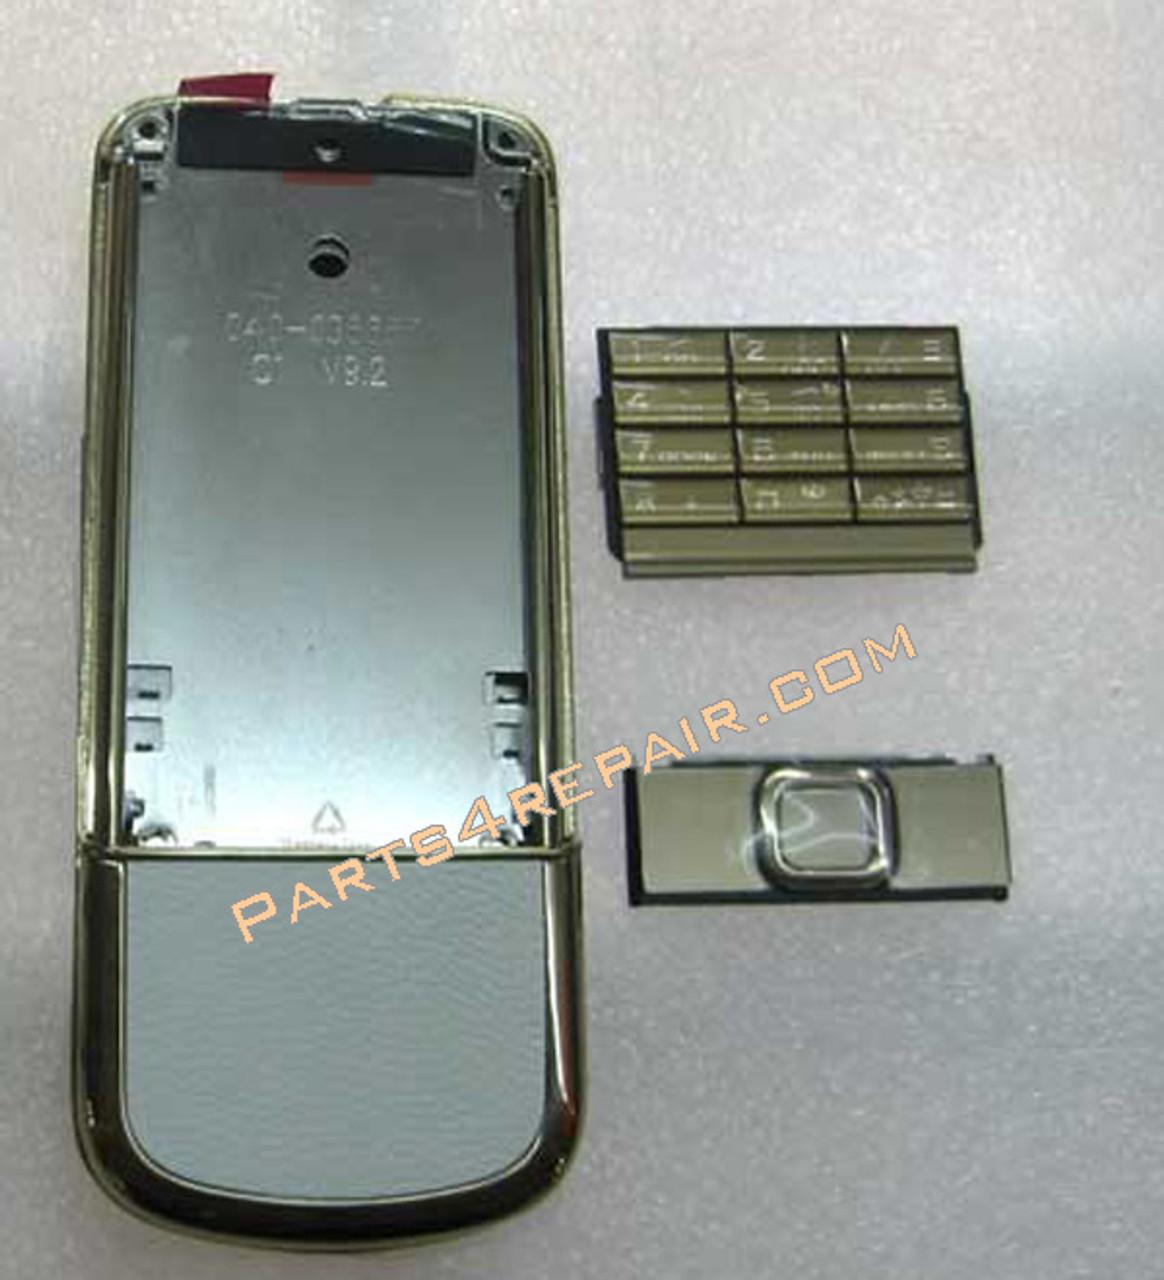 Full Housing Cover Replacement For Nokia 8800 Gold Arte 4g Parts4repair Com